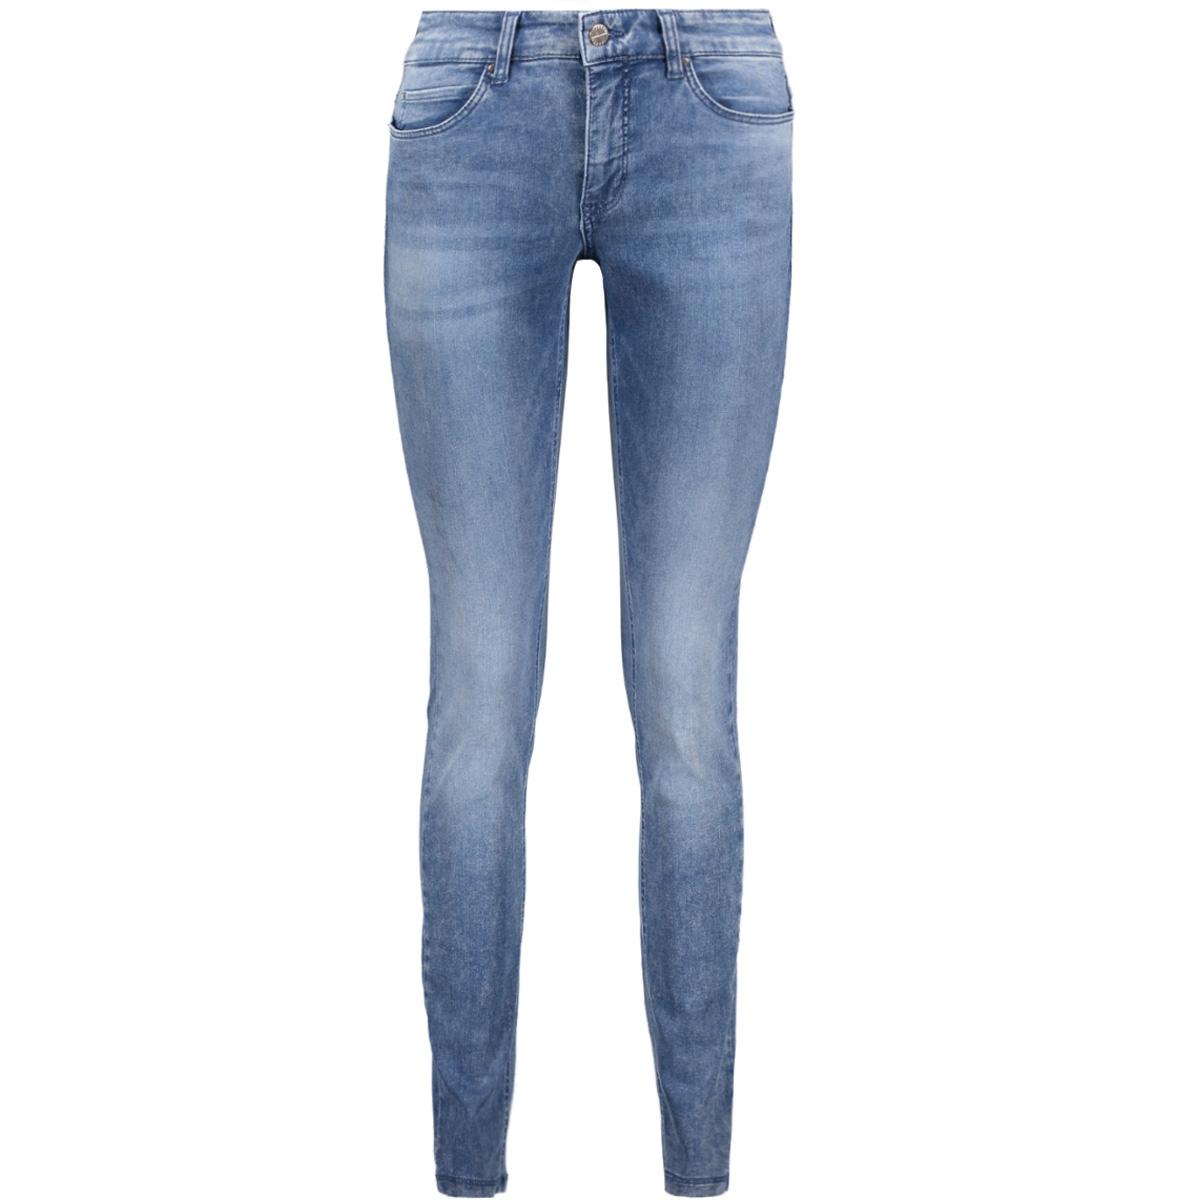 5402 90 0355 mac jeans d549